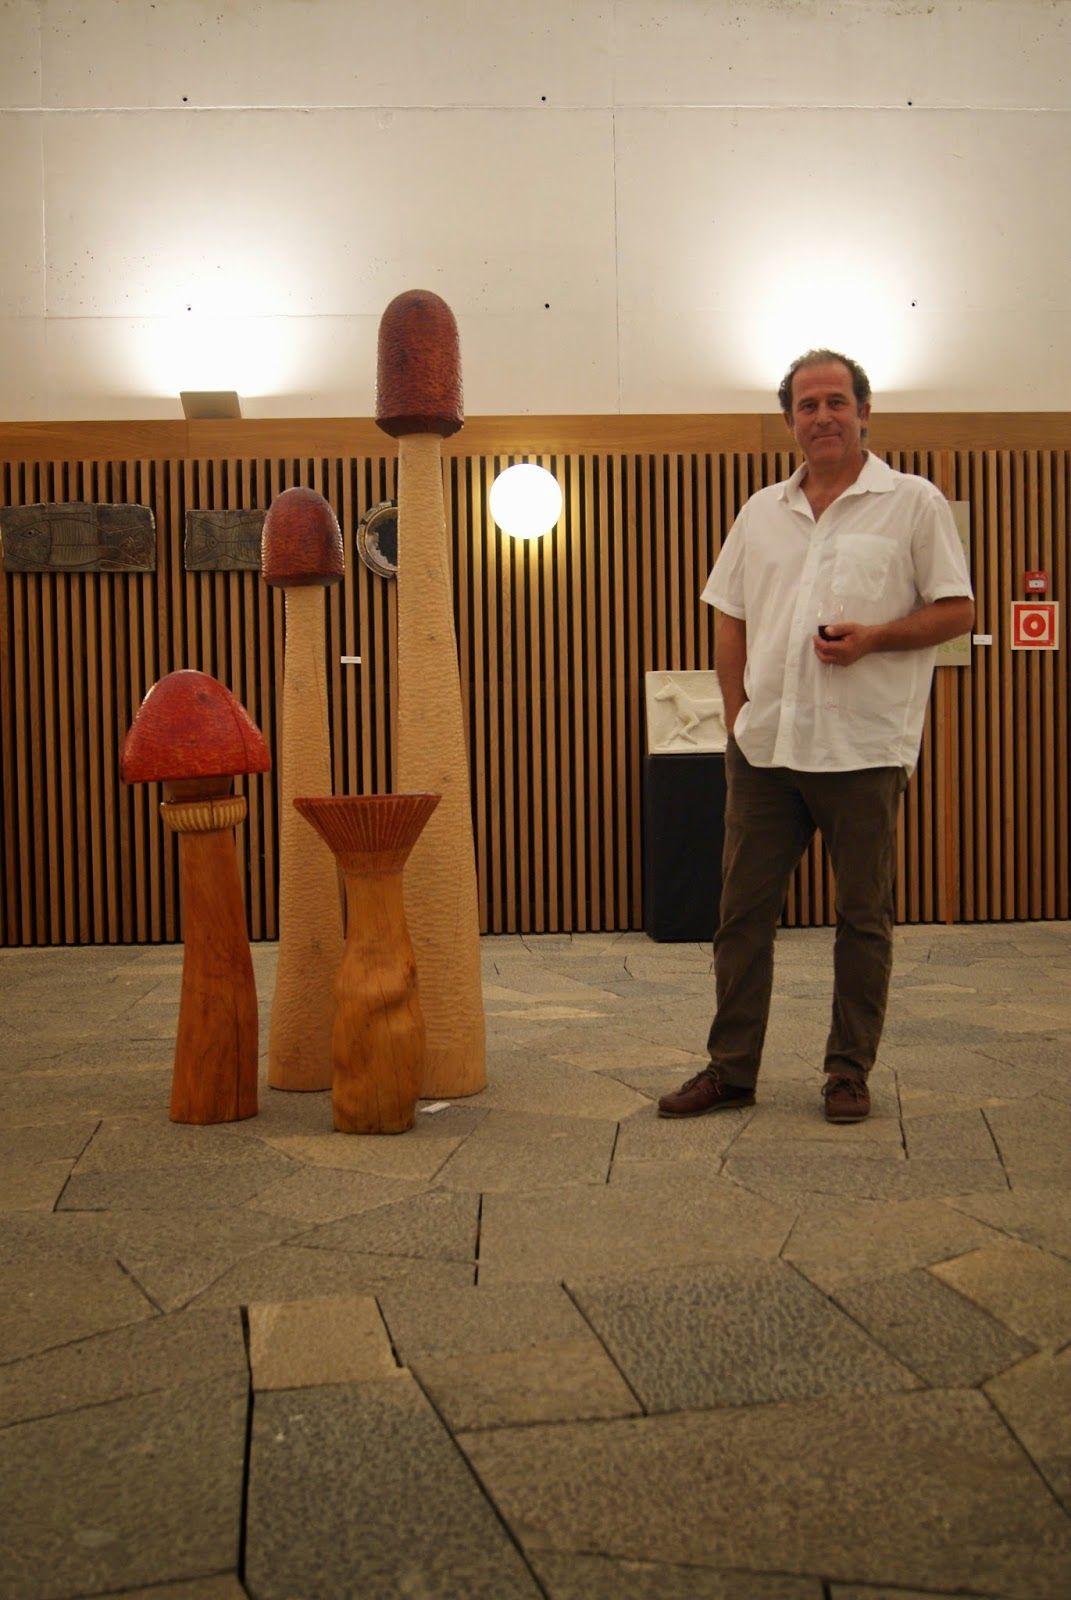 AMAE. EXPOSICIÓ COL-LECTIVA PALAU DE CONGRESSOS D'EIVISSA. Gustavo Eznarriaga.